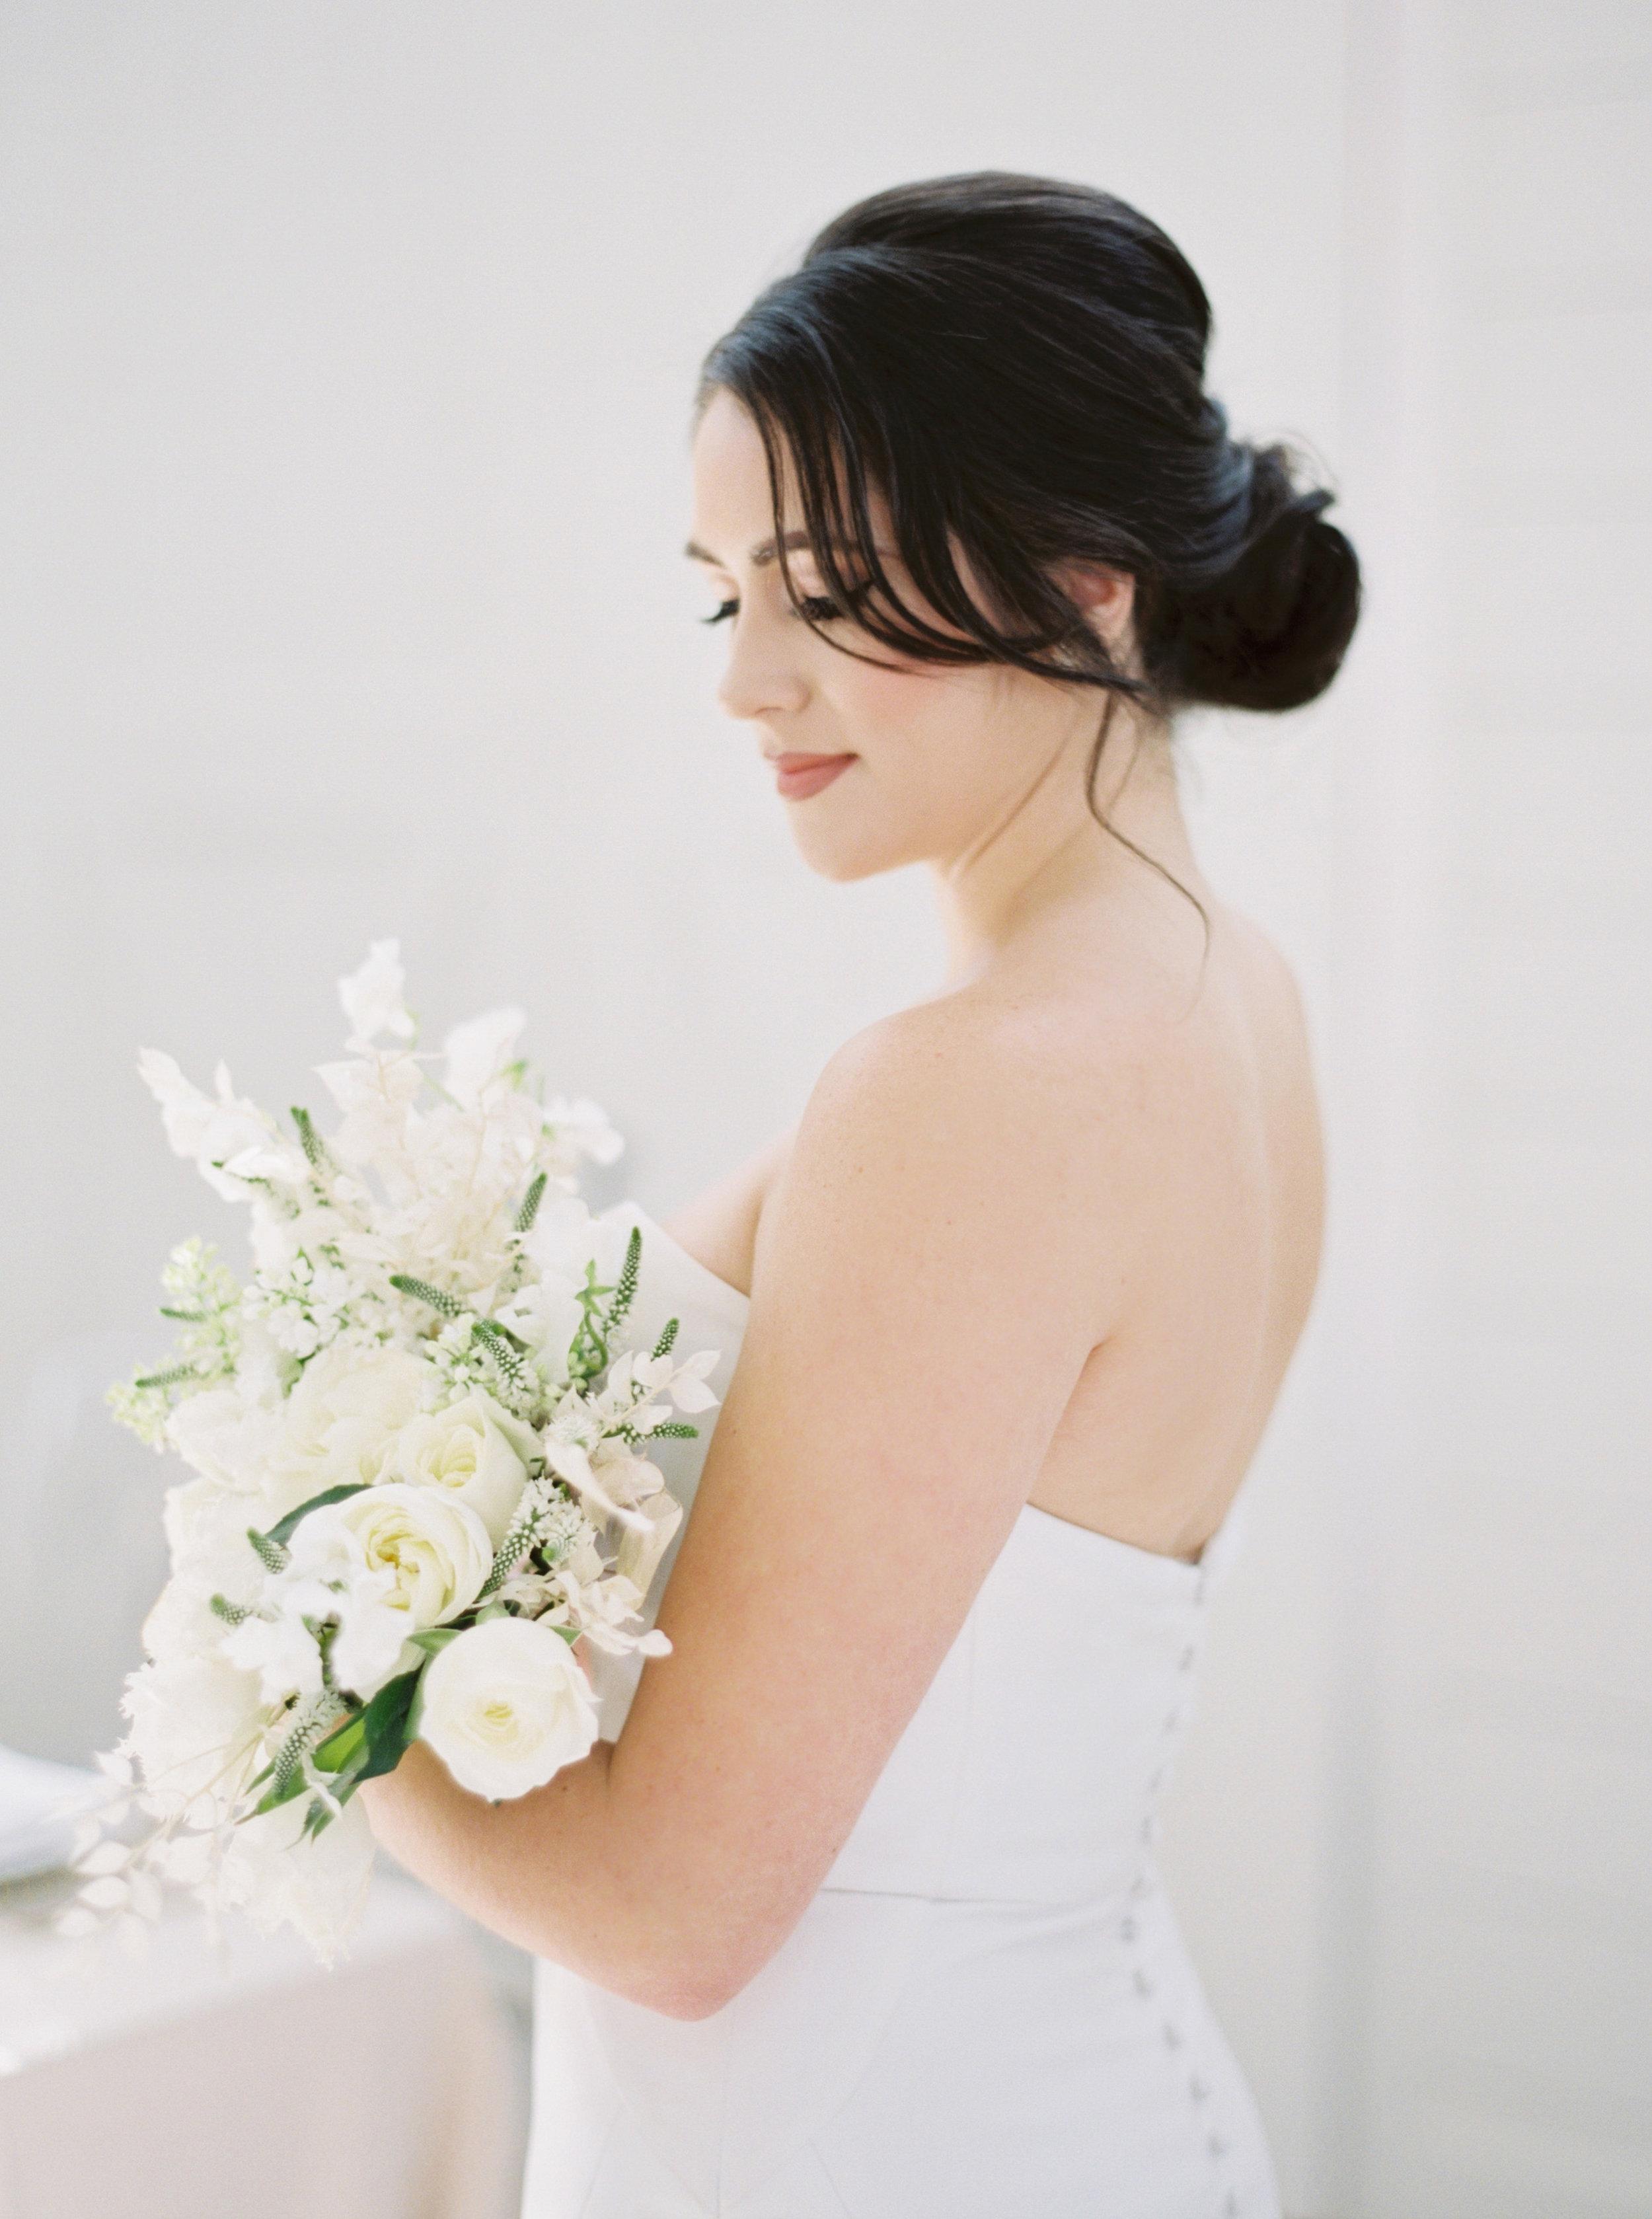 BOOK OF BEAUTIFUL WEDDINGS COVER   WACO, TX